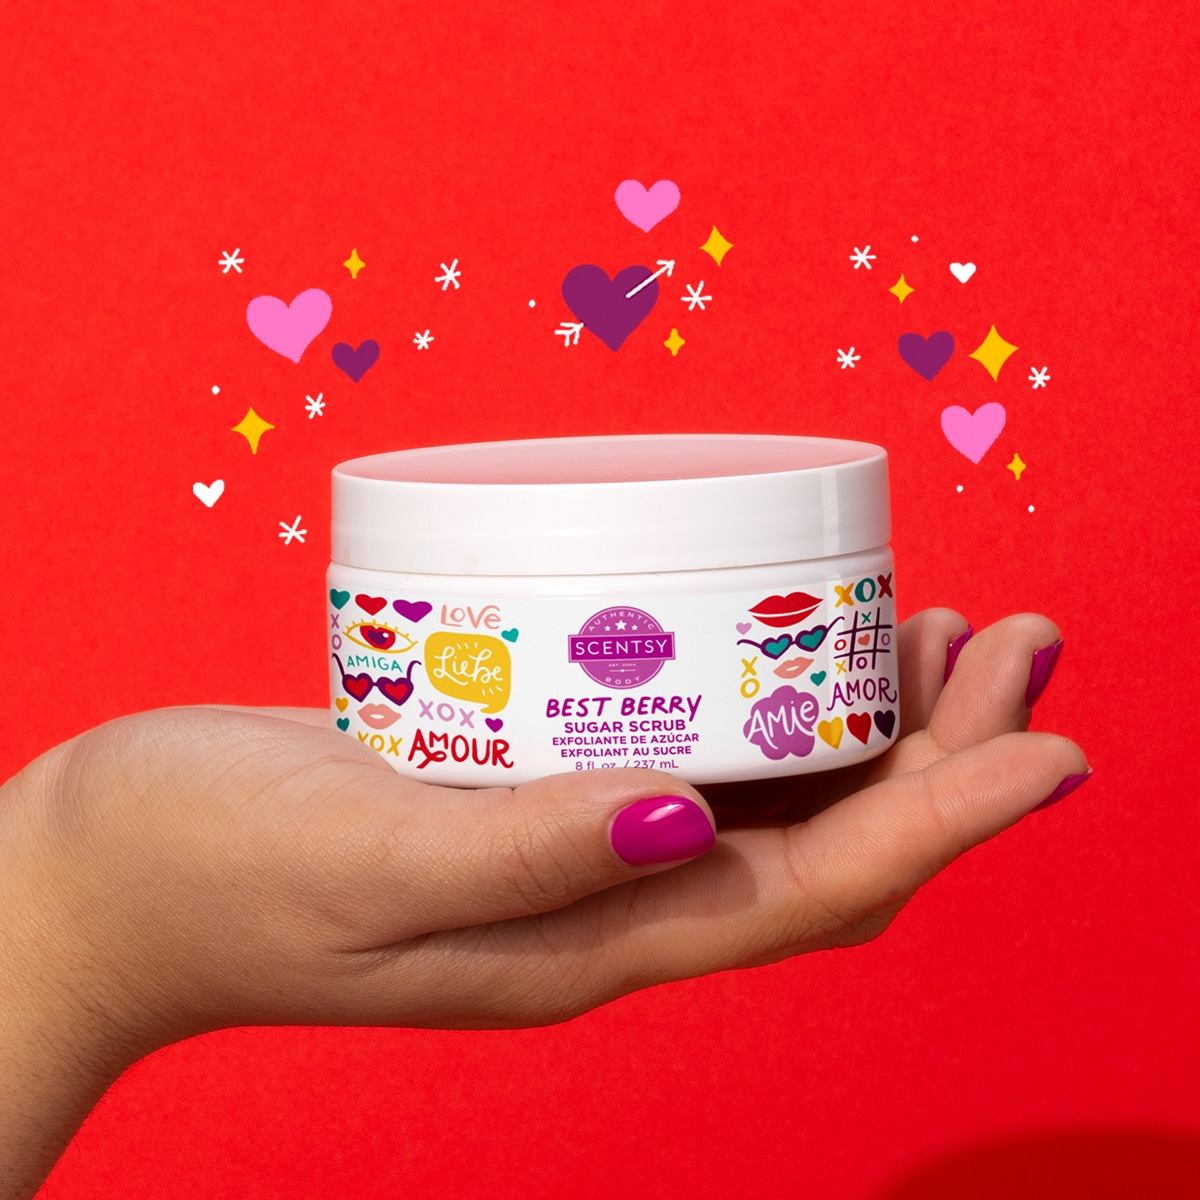 scentsy berry sugar scrub